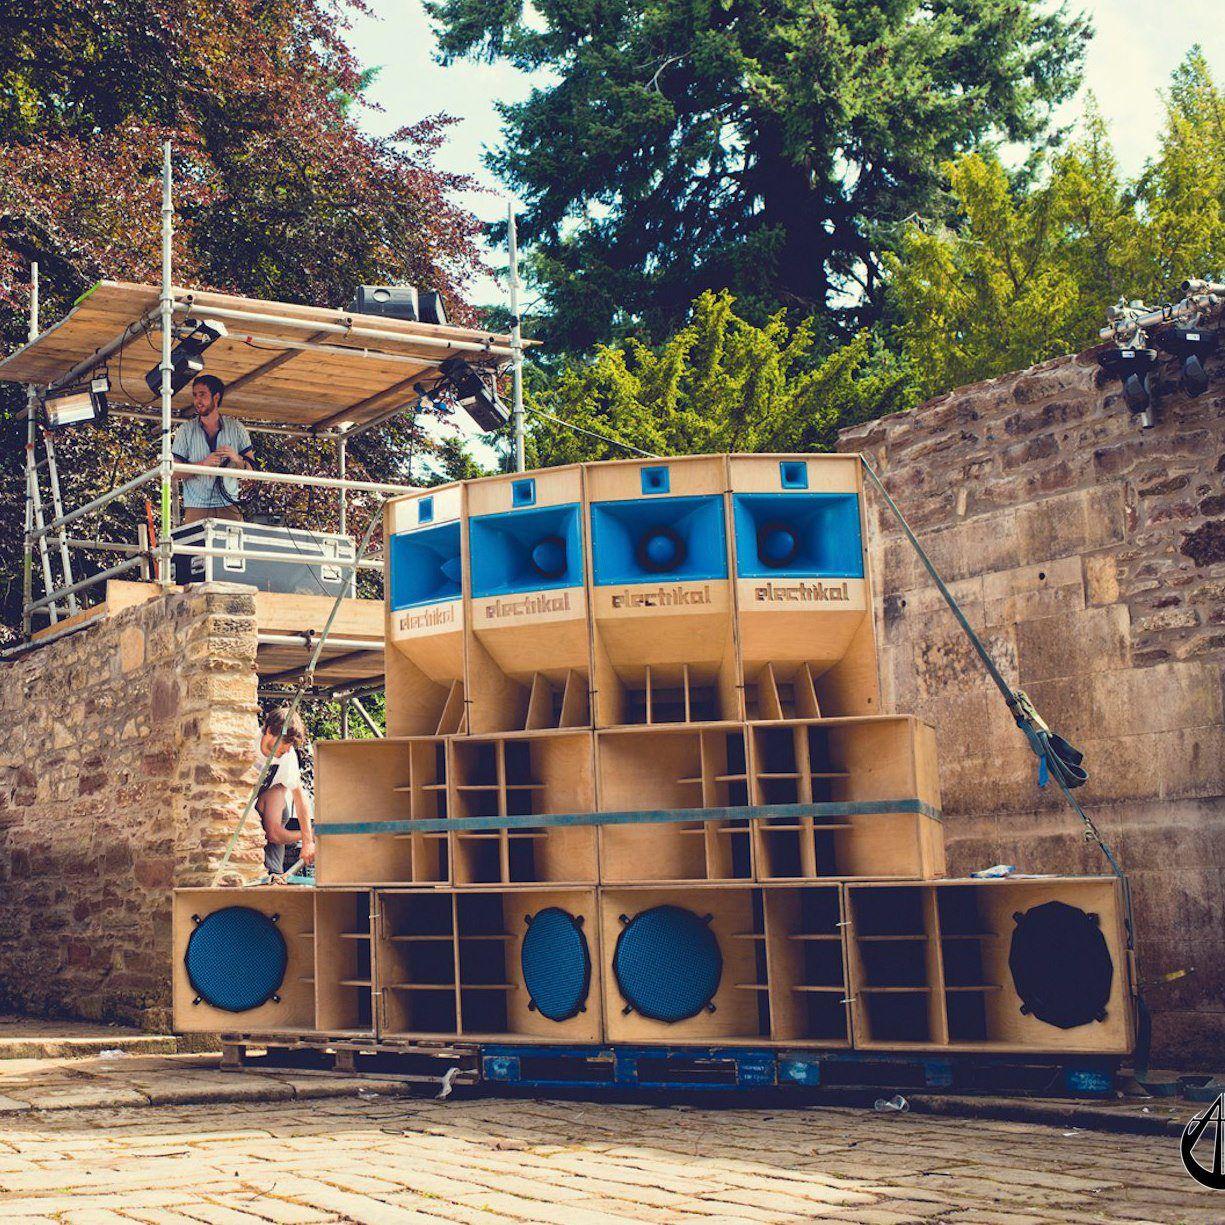 King Shiloh Sound System (Amsterdam, Netherlands). | Sound System |  Pinterest | Bass - King Shiloh Sound System (Amsterdam, Netherlands). Sound System